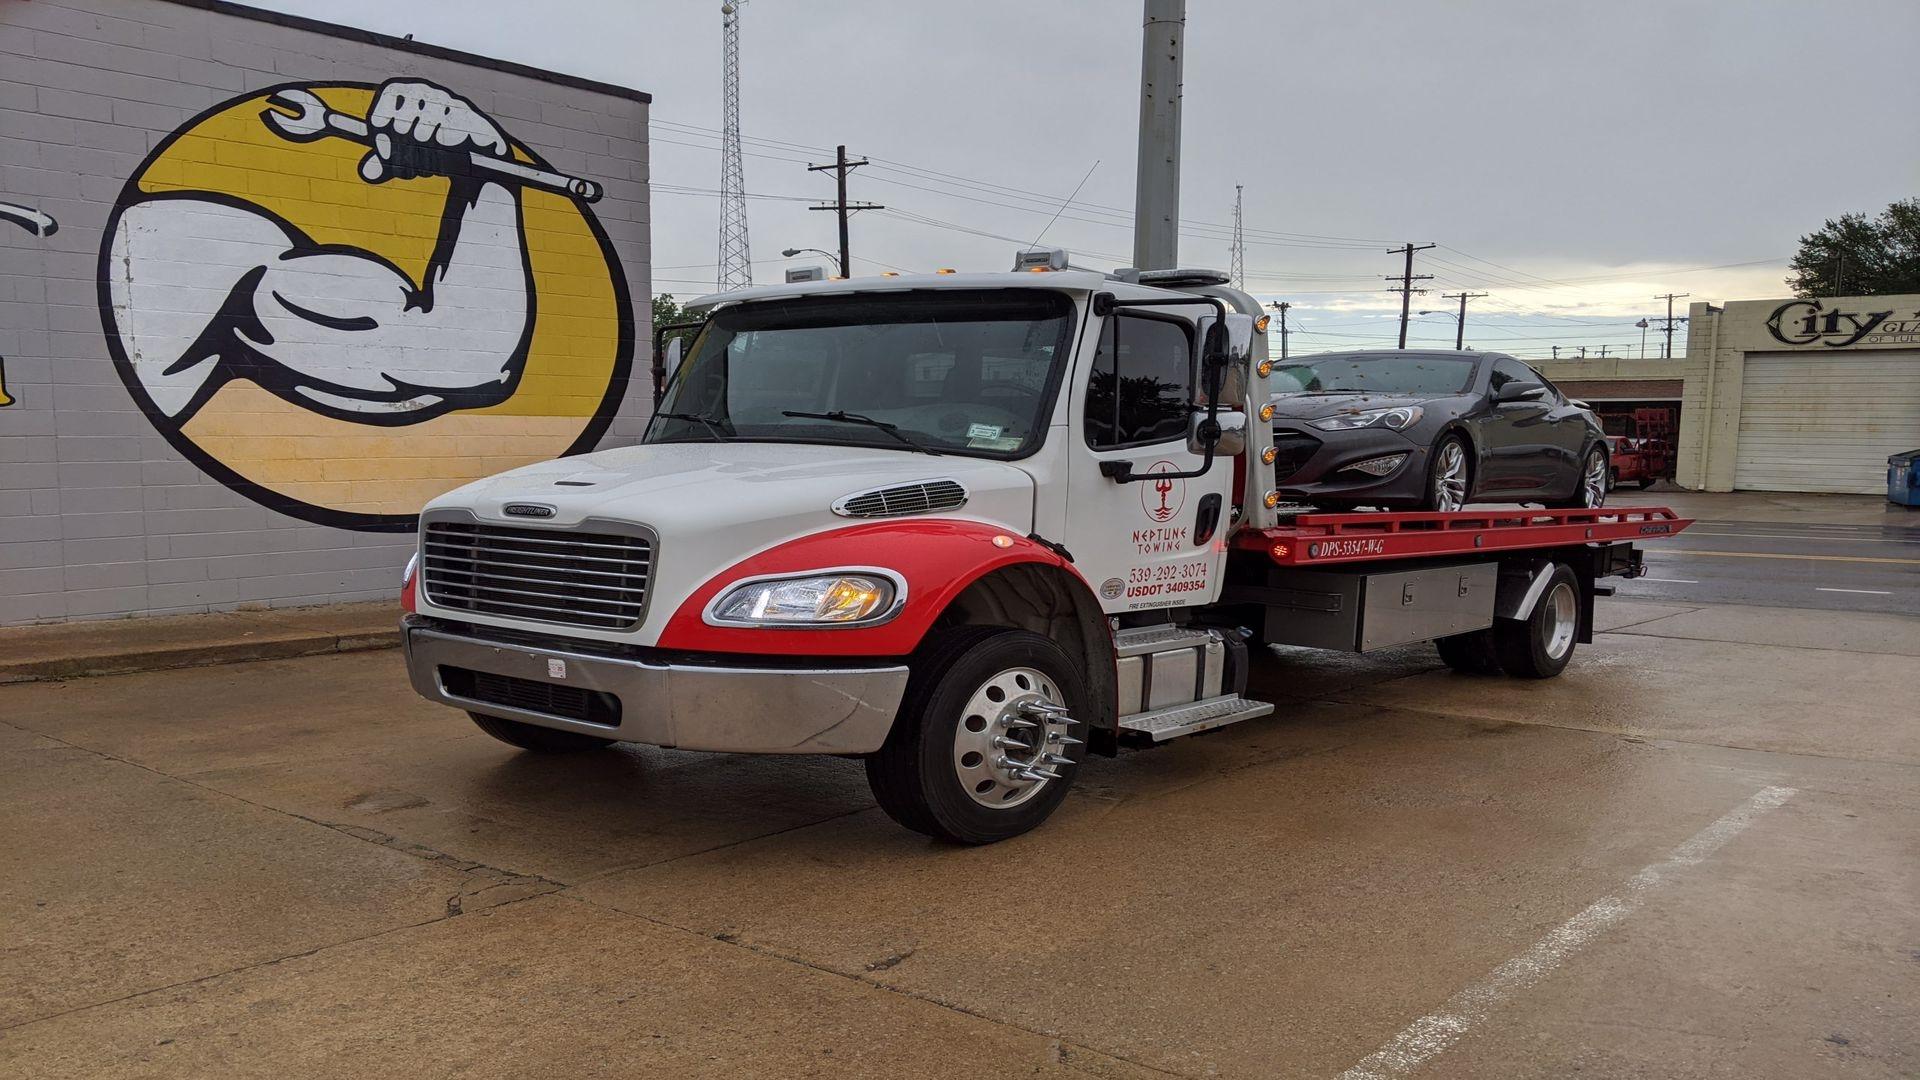 wrecker service Tulsa (@towingservicetulsa) Cover Image